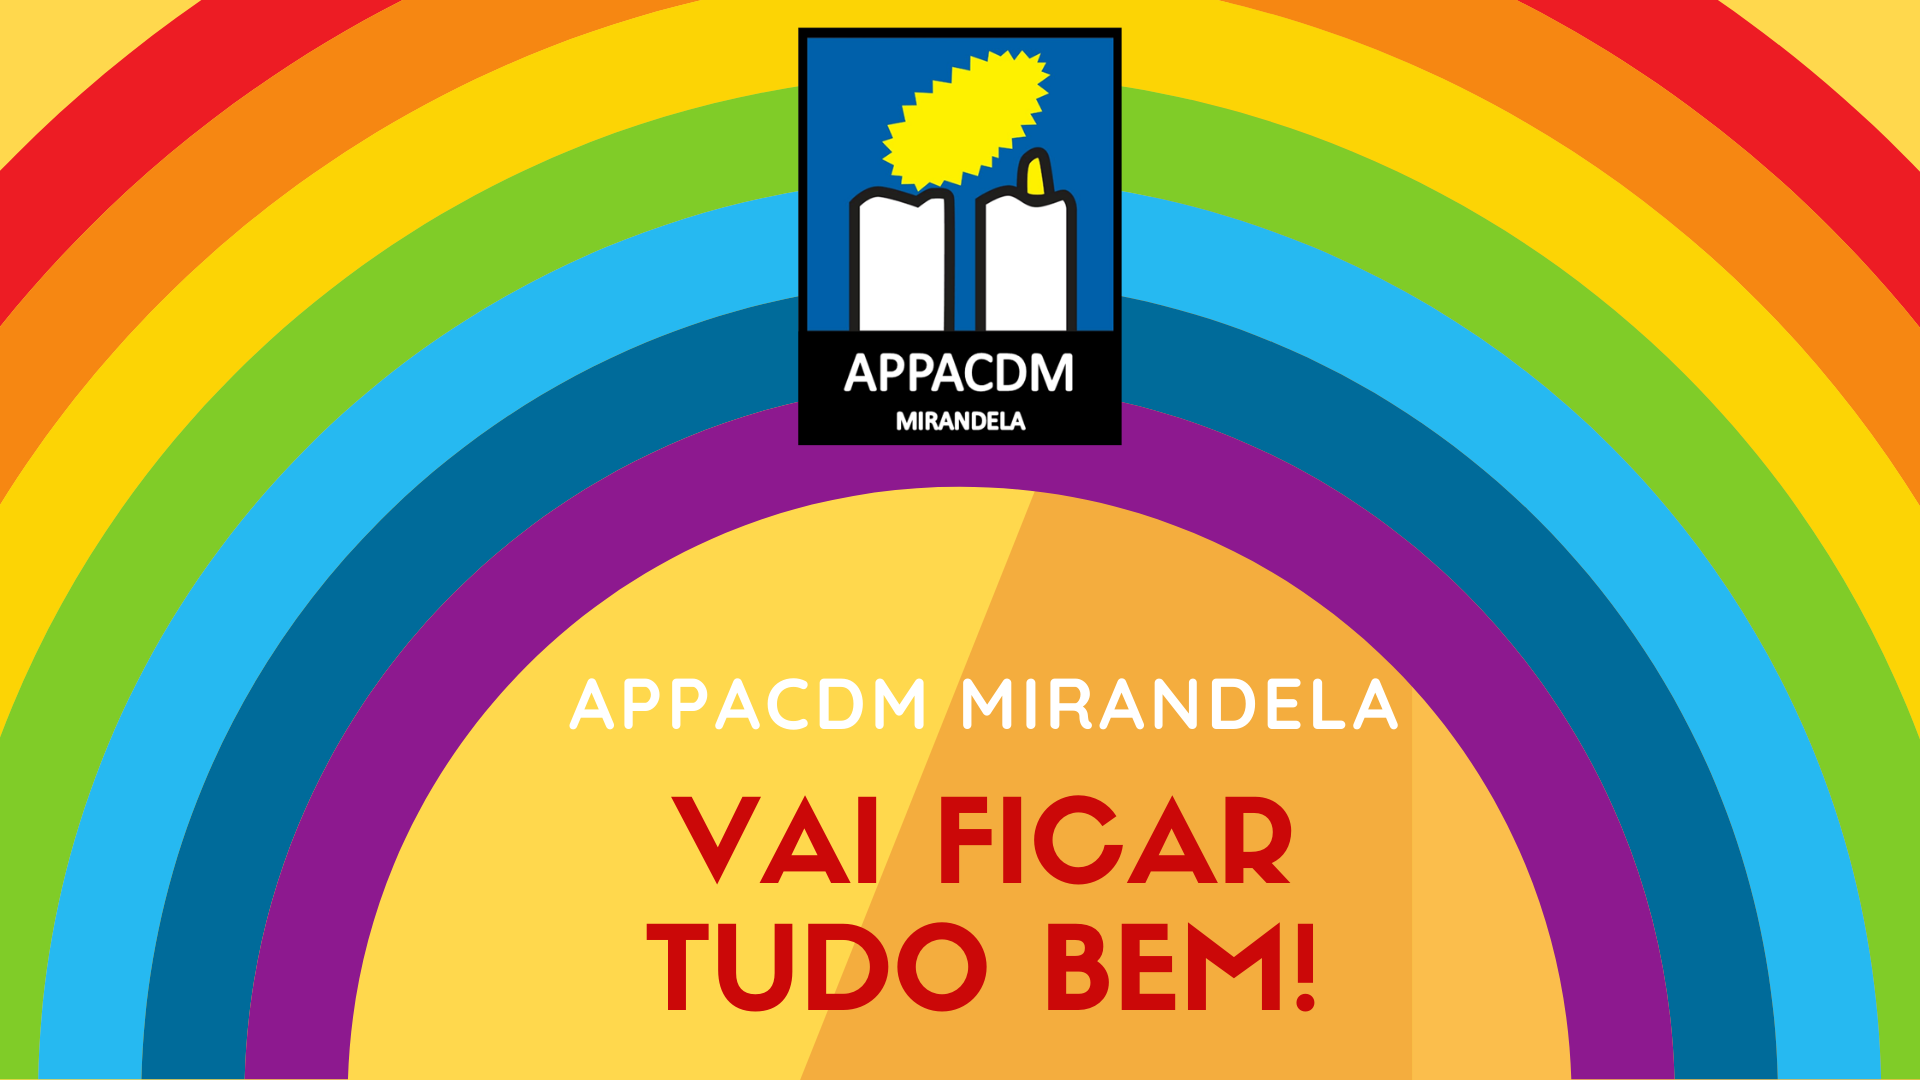 APPACDM Mirandela